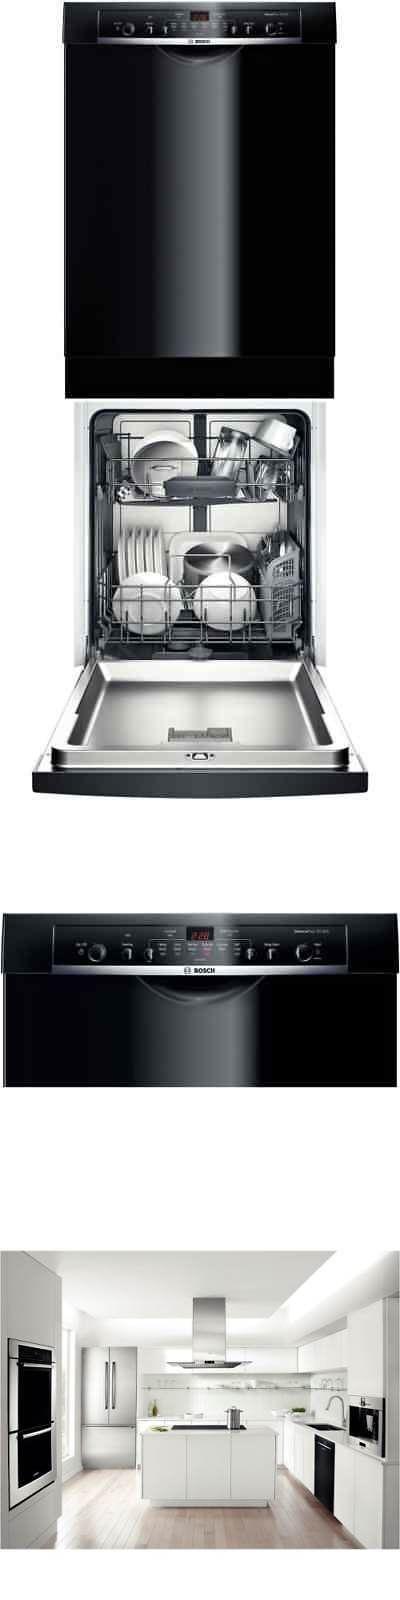 Dishwashers 116023 Bosch She3ar76uc 24 Built In Dishwasher